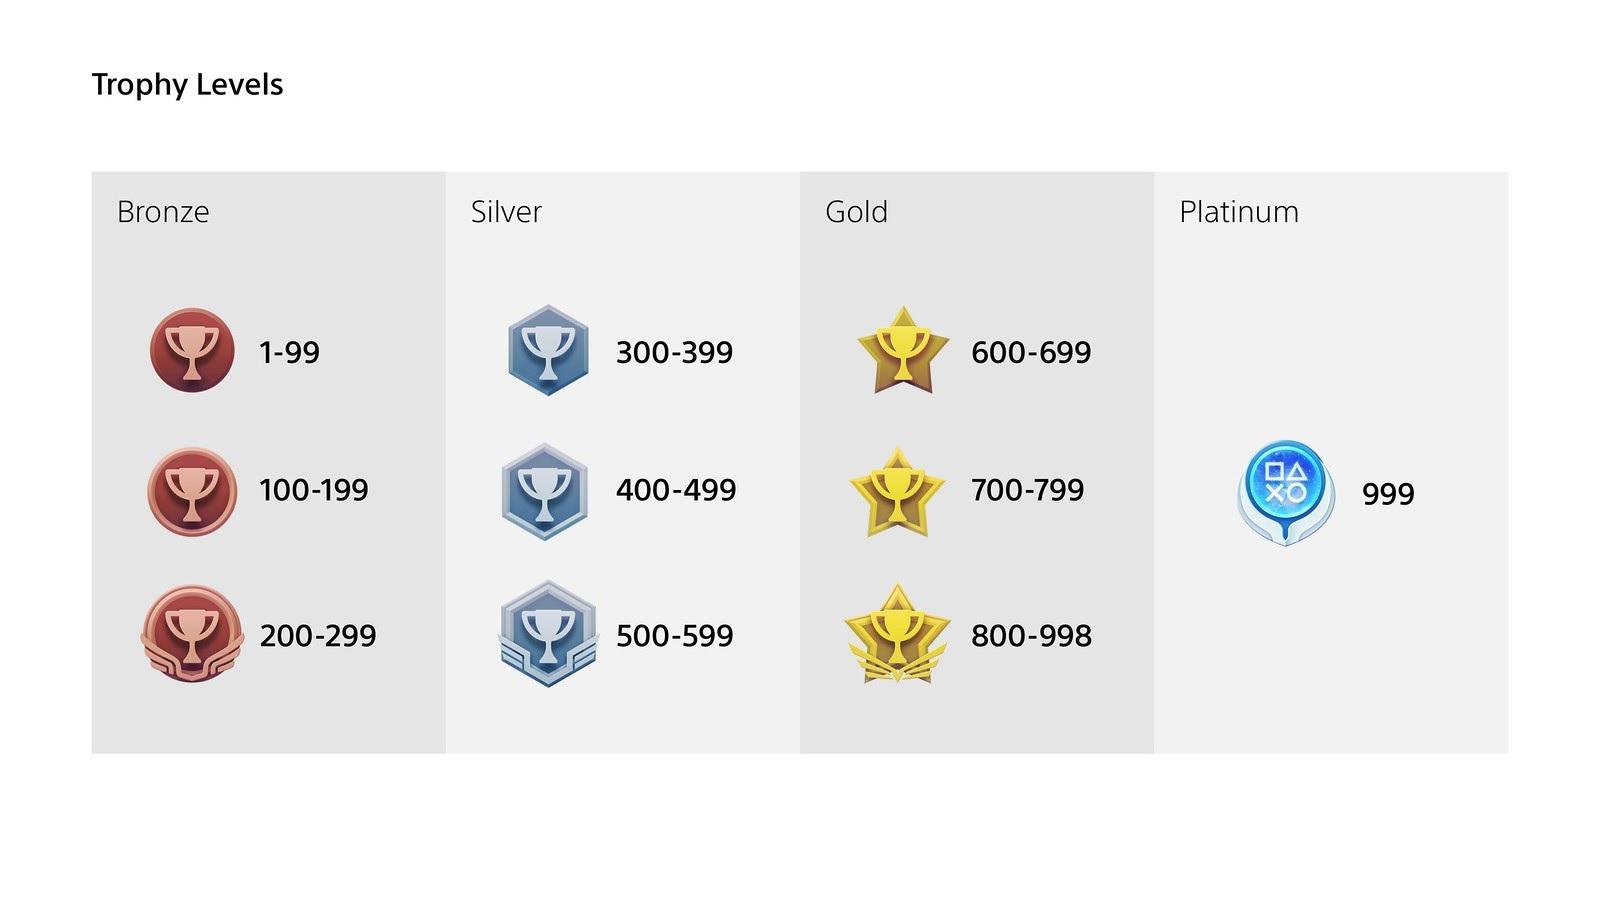 playstation 4 trophy levels ps4 trophy level 2